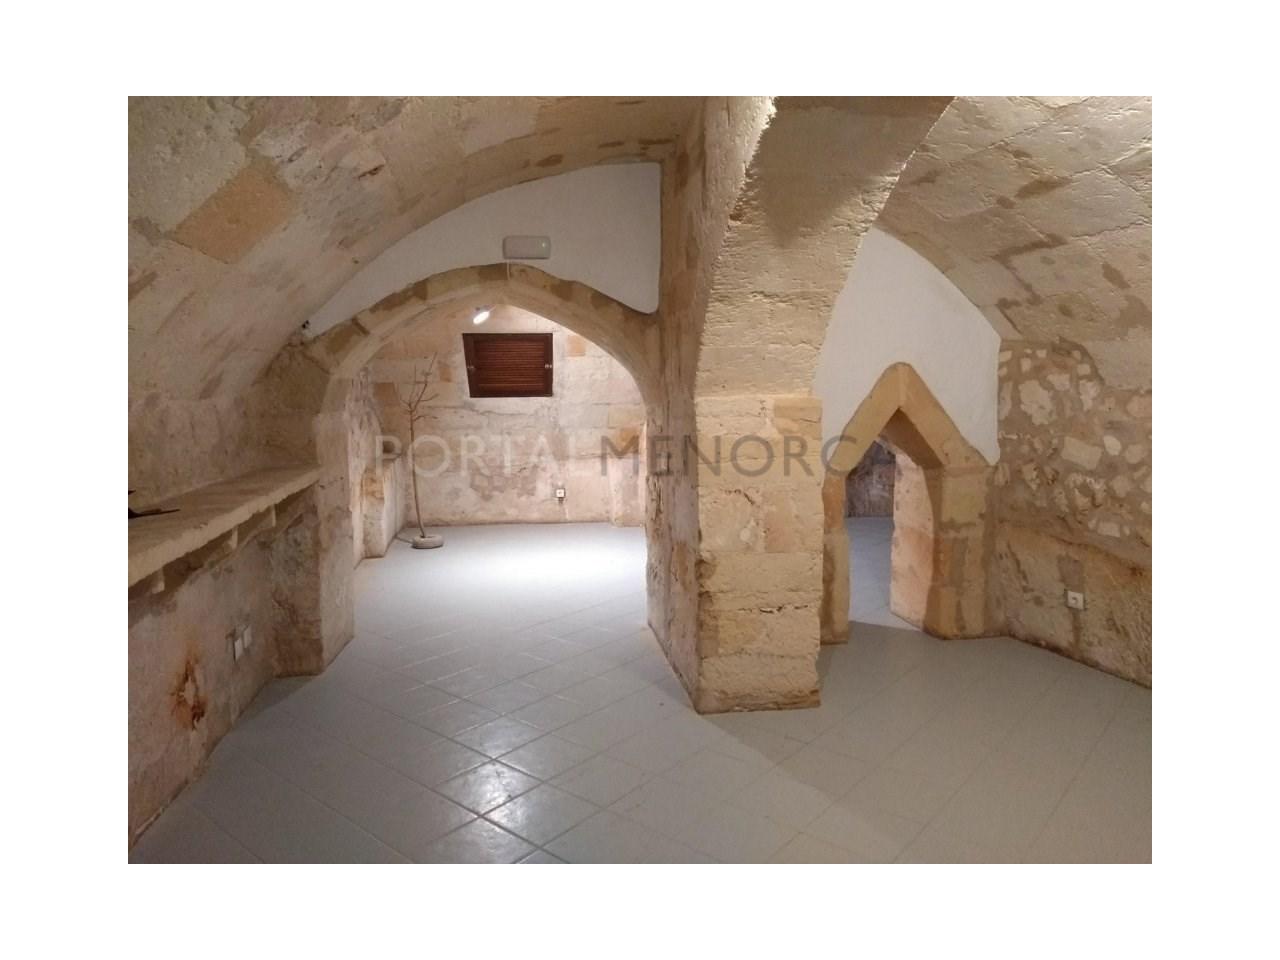 Manor house for sale in Ciutadella-basement 1